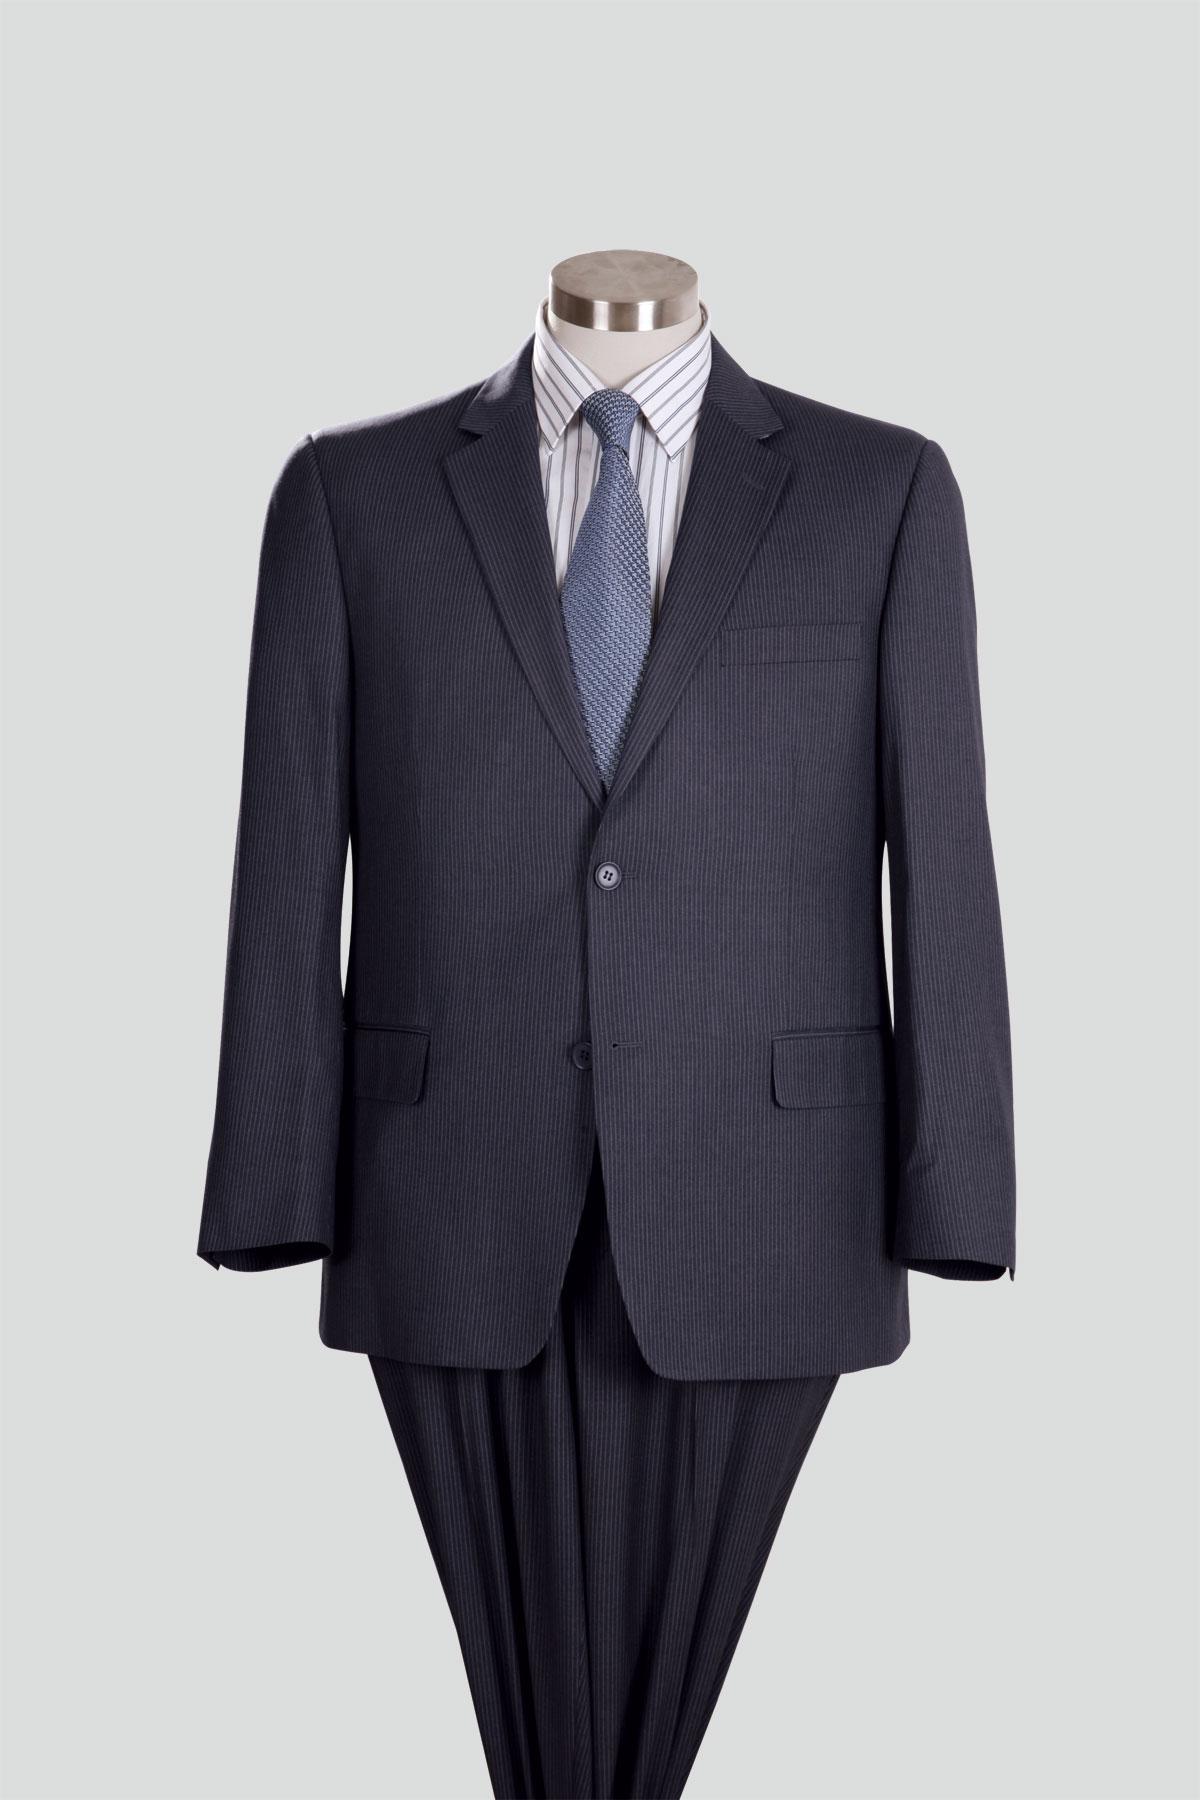 Renoir Men's Grey Pinstripe Blazer   Level 20 MenswearLevel 20 Menswear